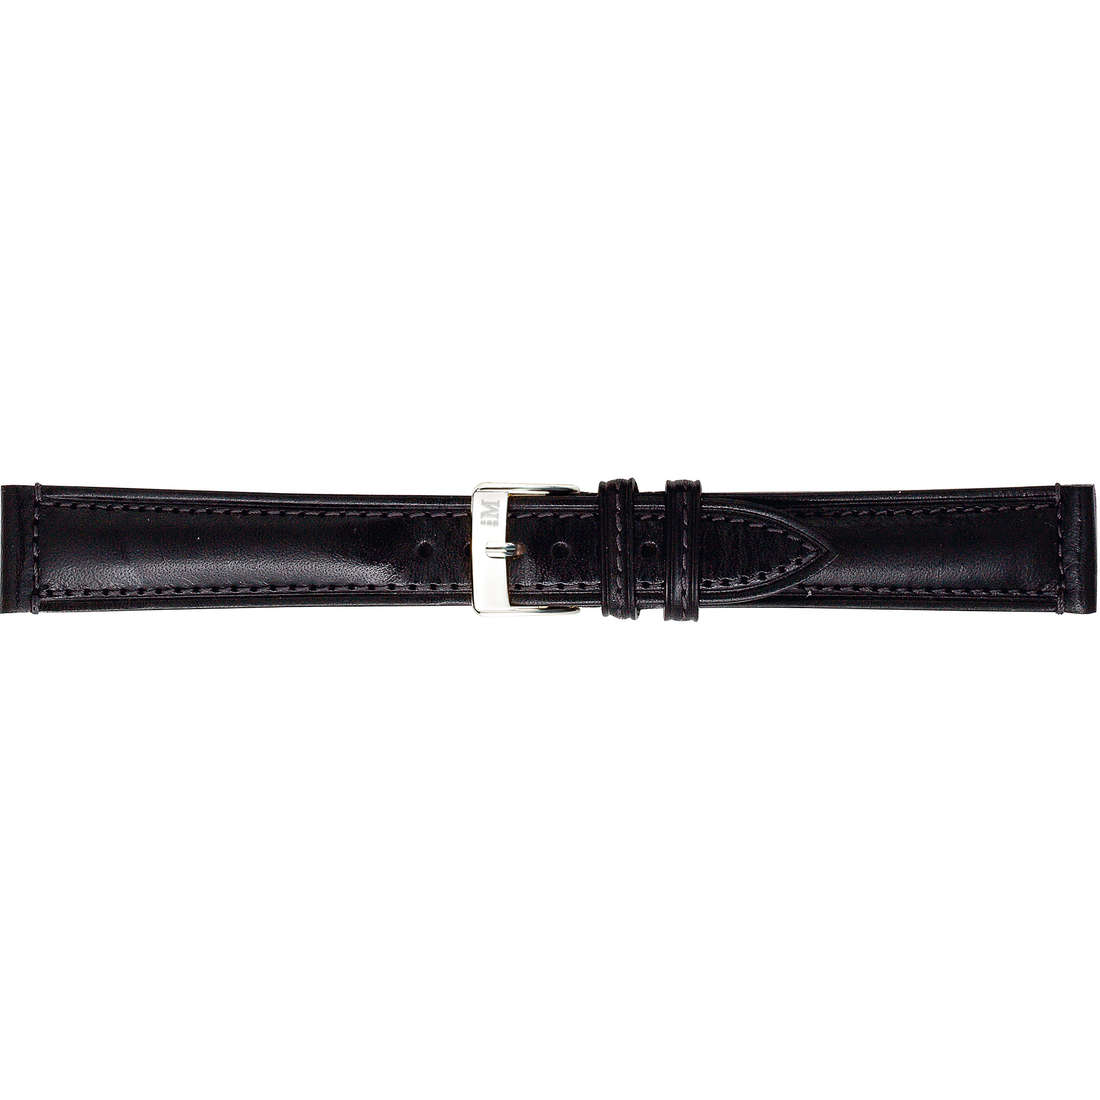 watch watch bands watch straps man Morellato Manufatti A01U0895403019CR16